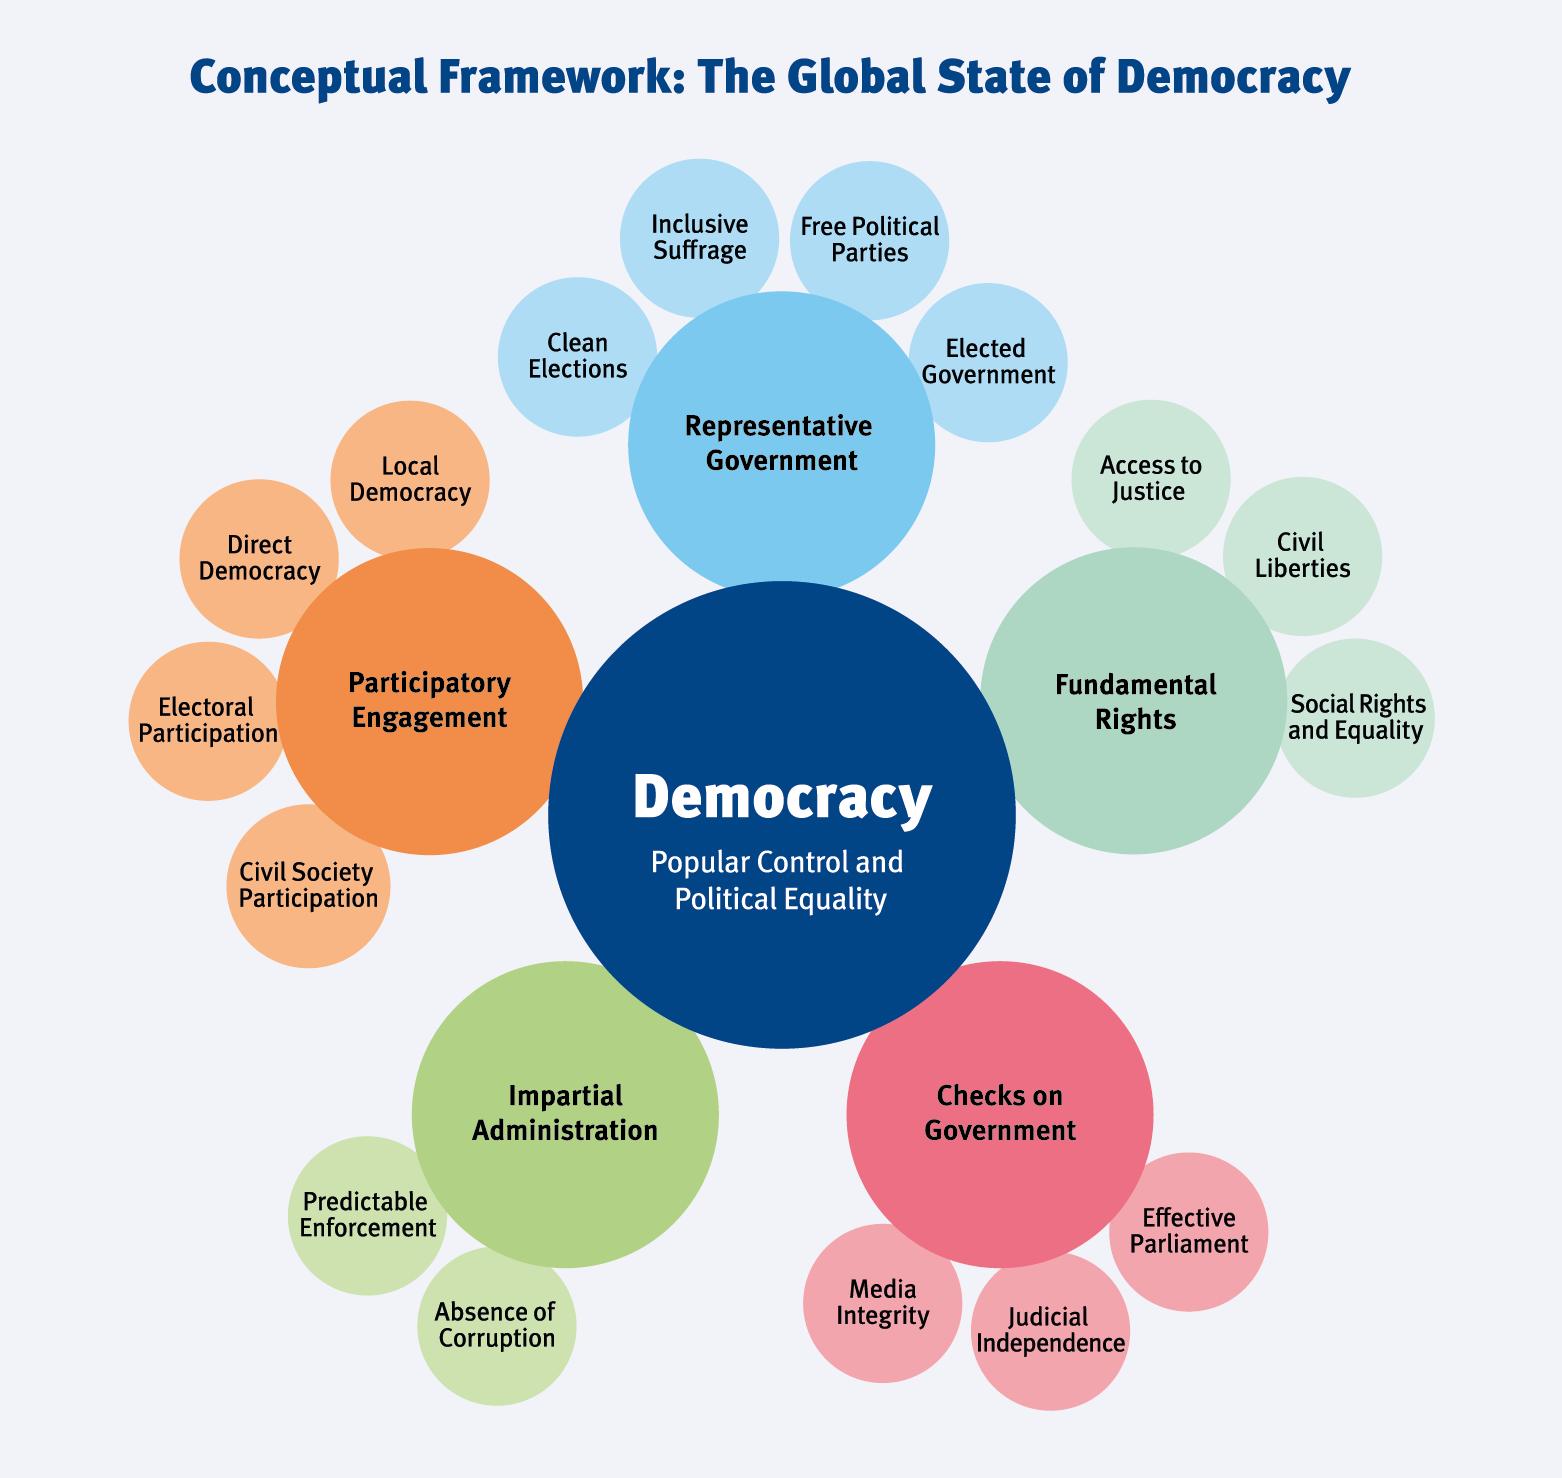 2018-IDEA_Infographic-Democracy-Conceptual-Framework